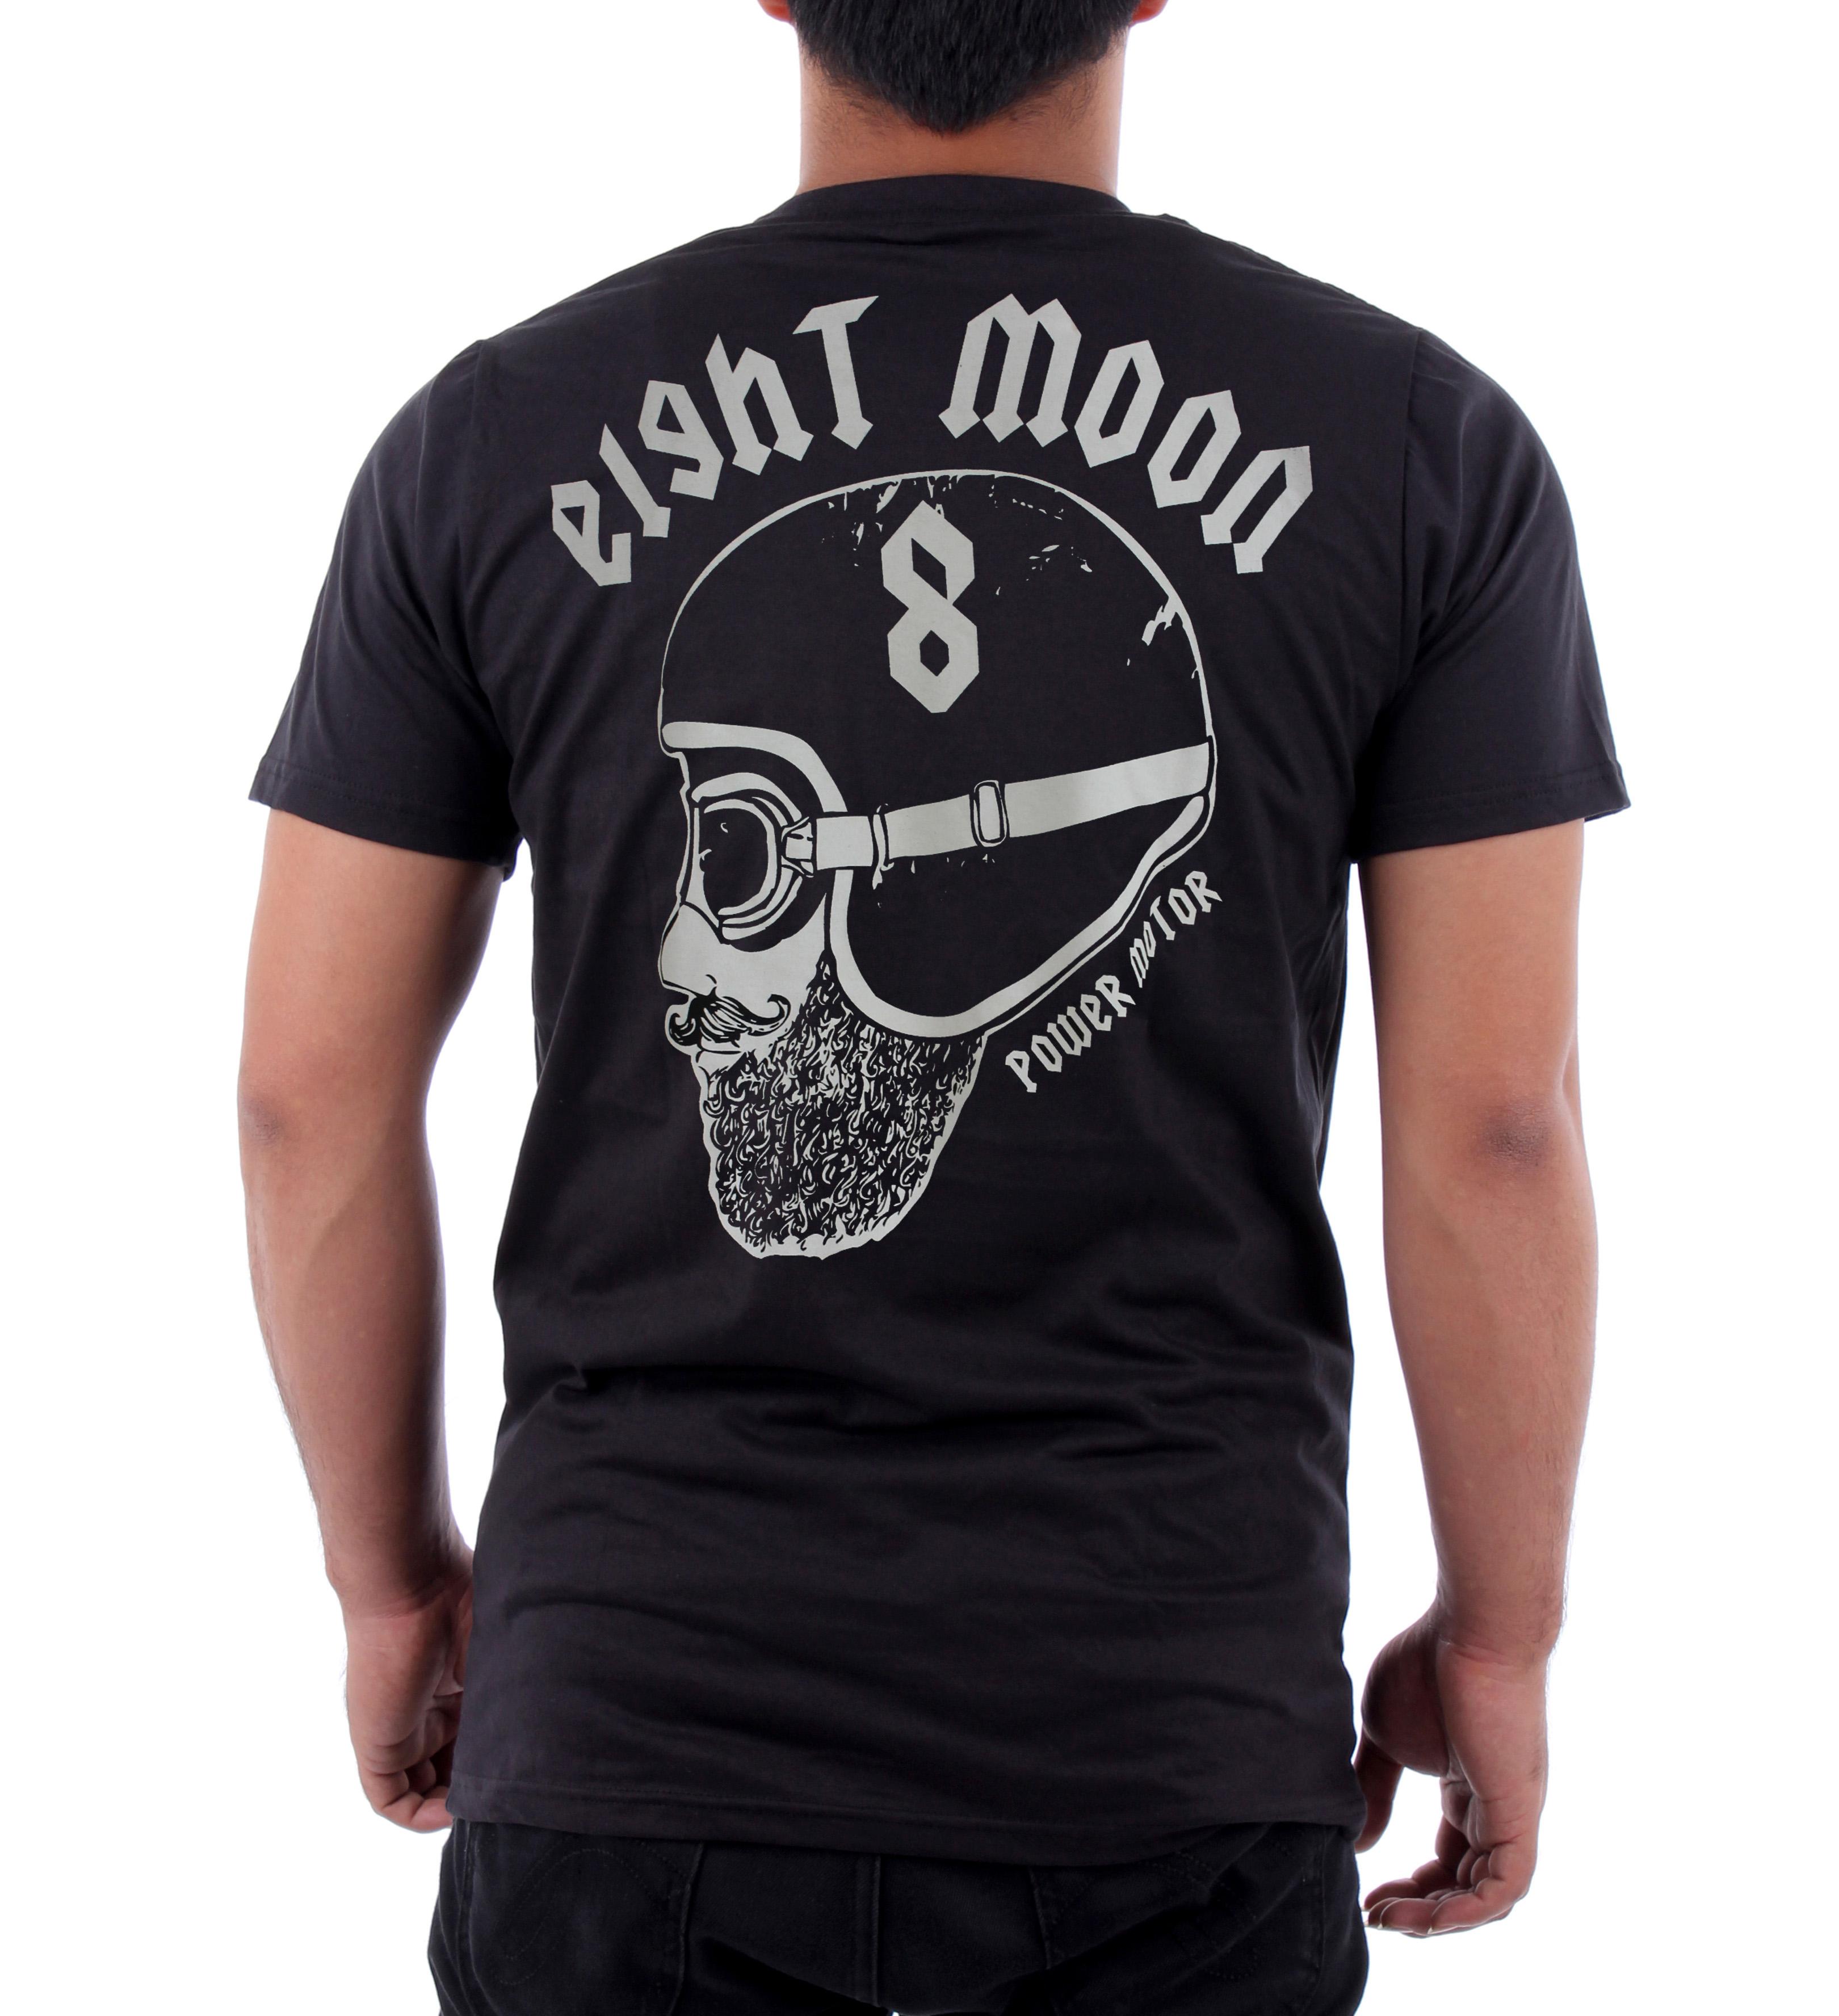 eight_moon_rockabilly_mens_shirt_west_coast_chopper_motorcycles_rock_en8_t_shirts_4.jpg